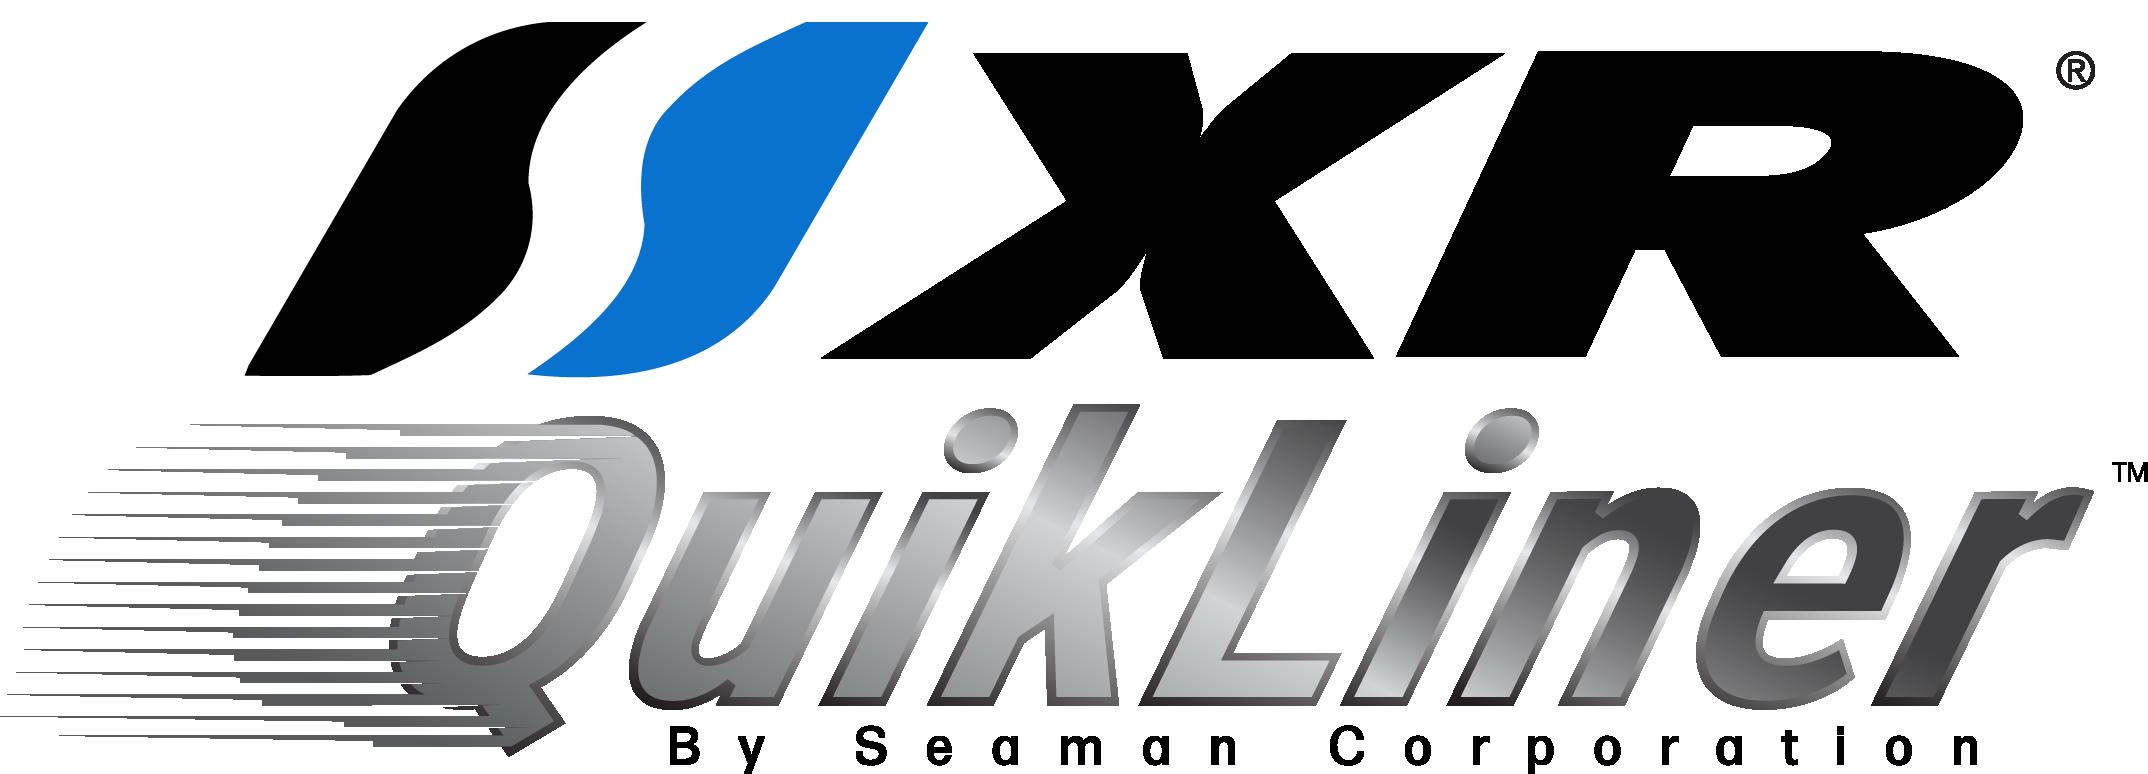 quickline logo.png